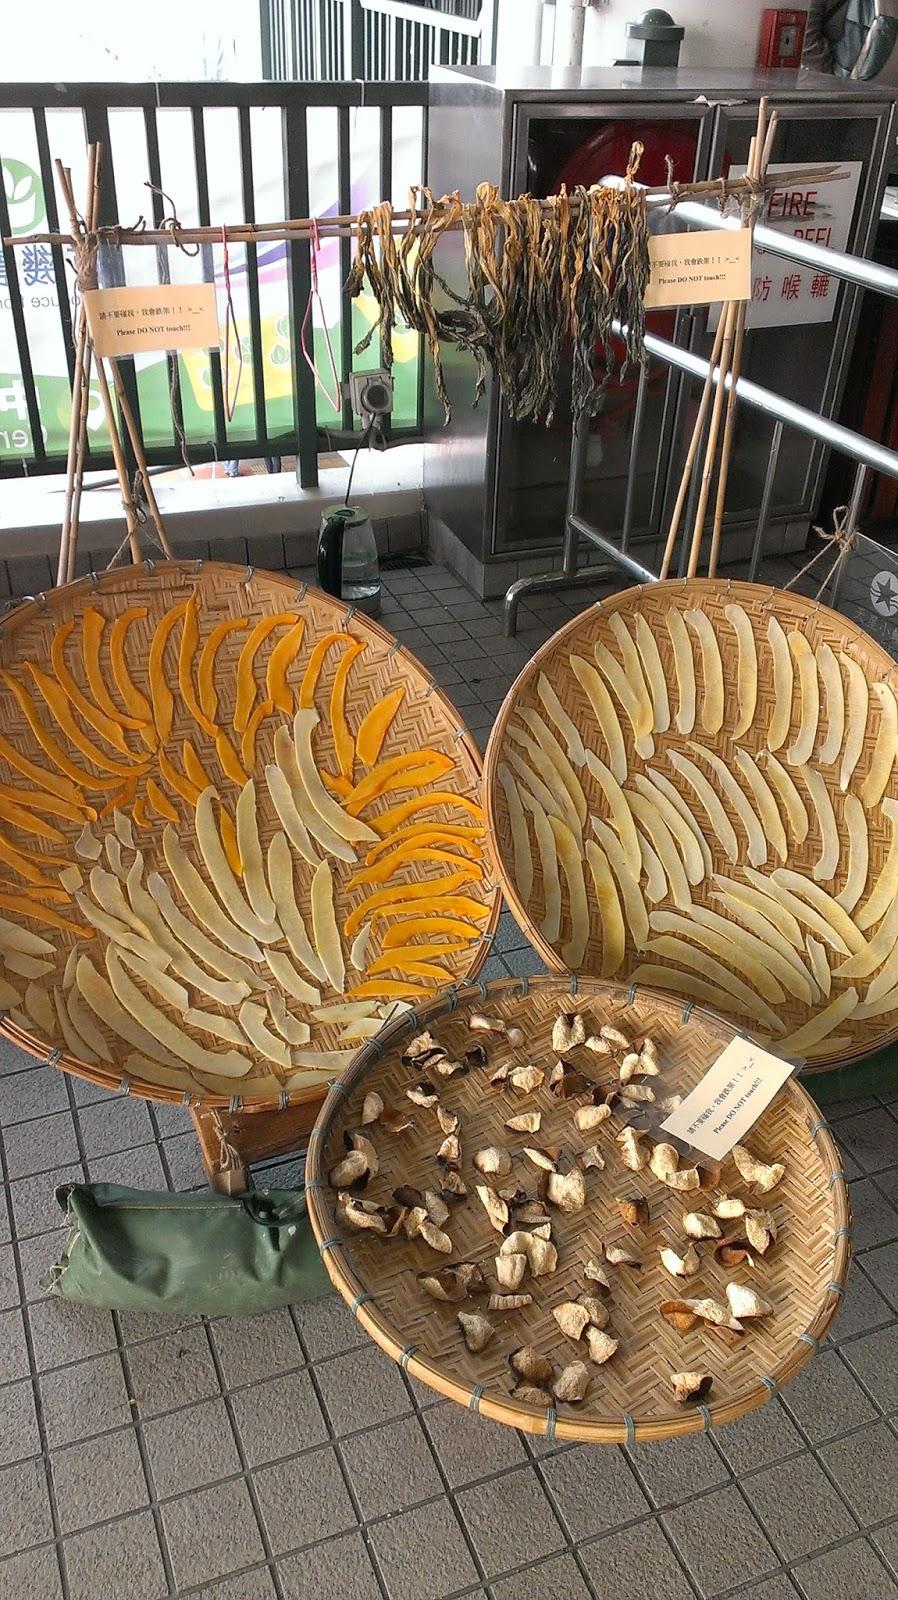 V. Cristo 素阿圖: 自製菜乾和菜甫……沒完成的……